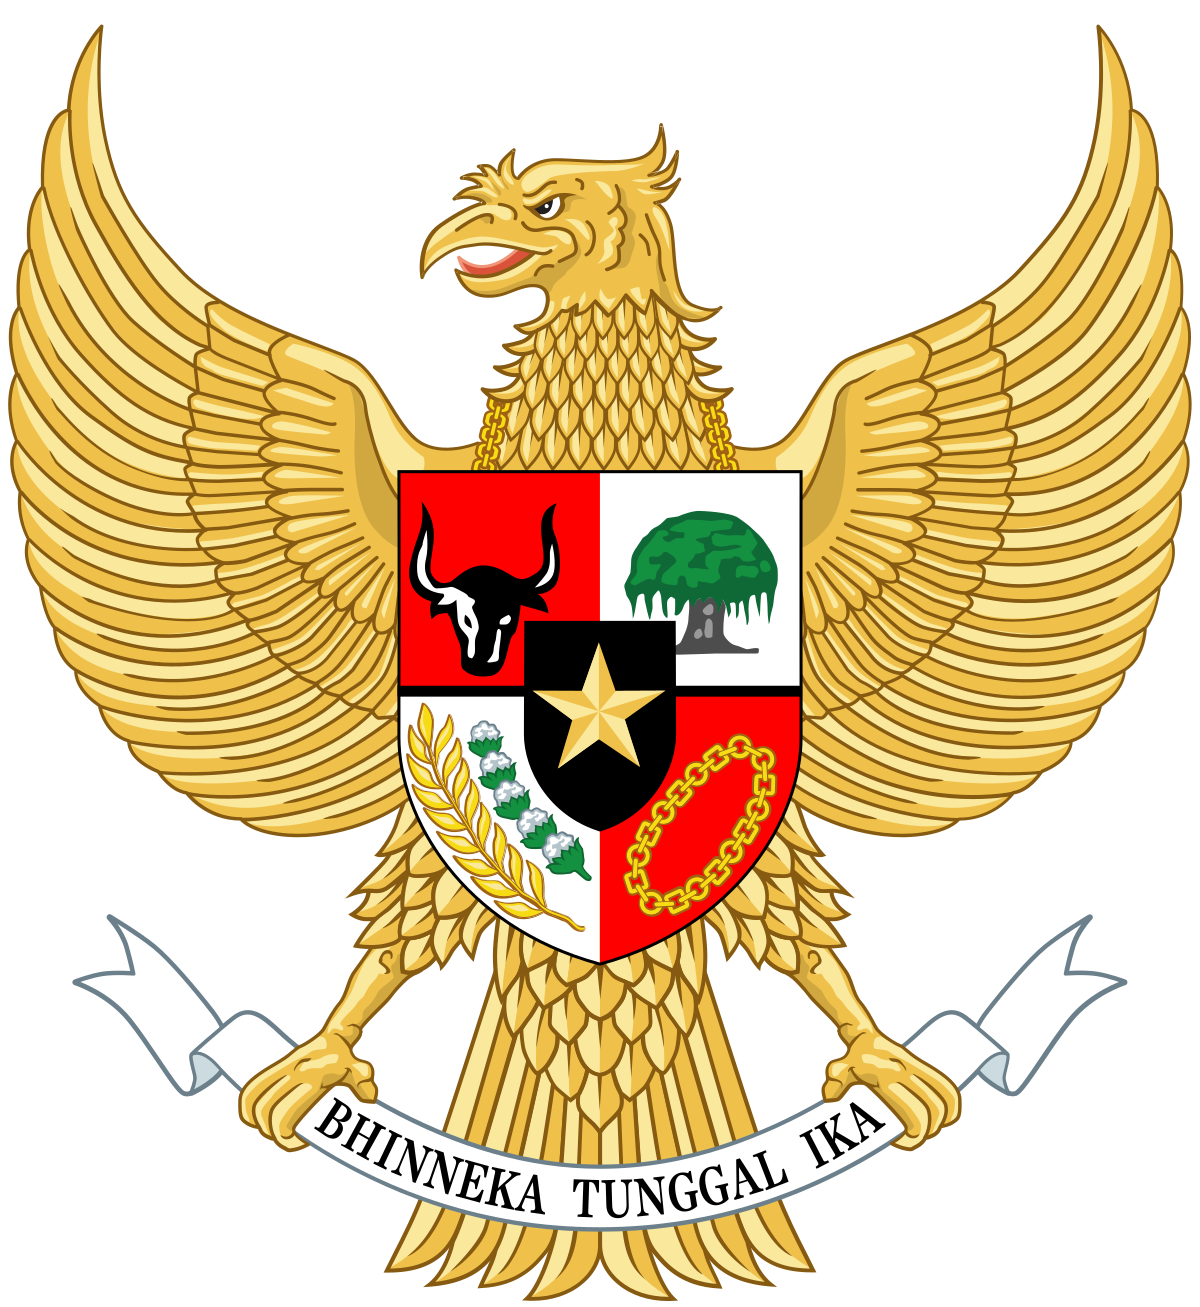 Fungsi Lambang Negara Indonesia